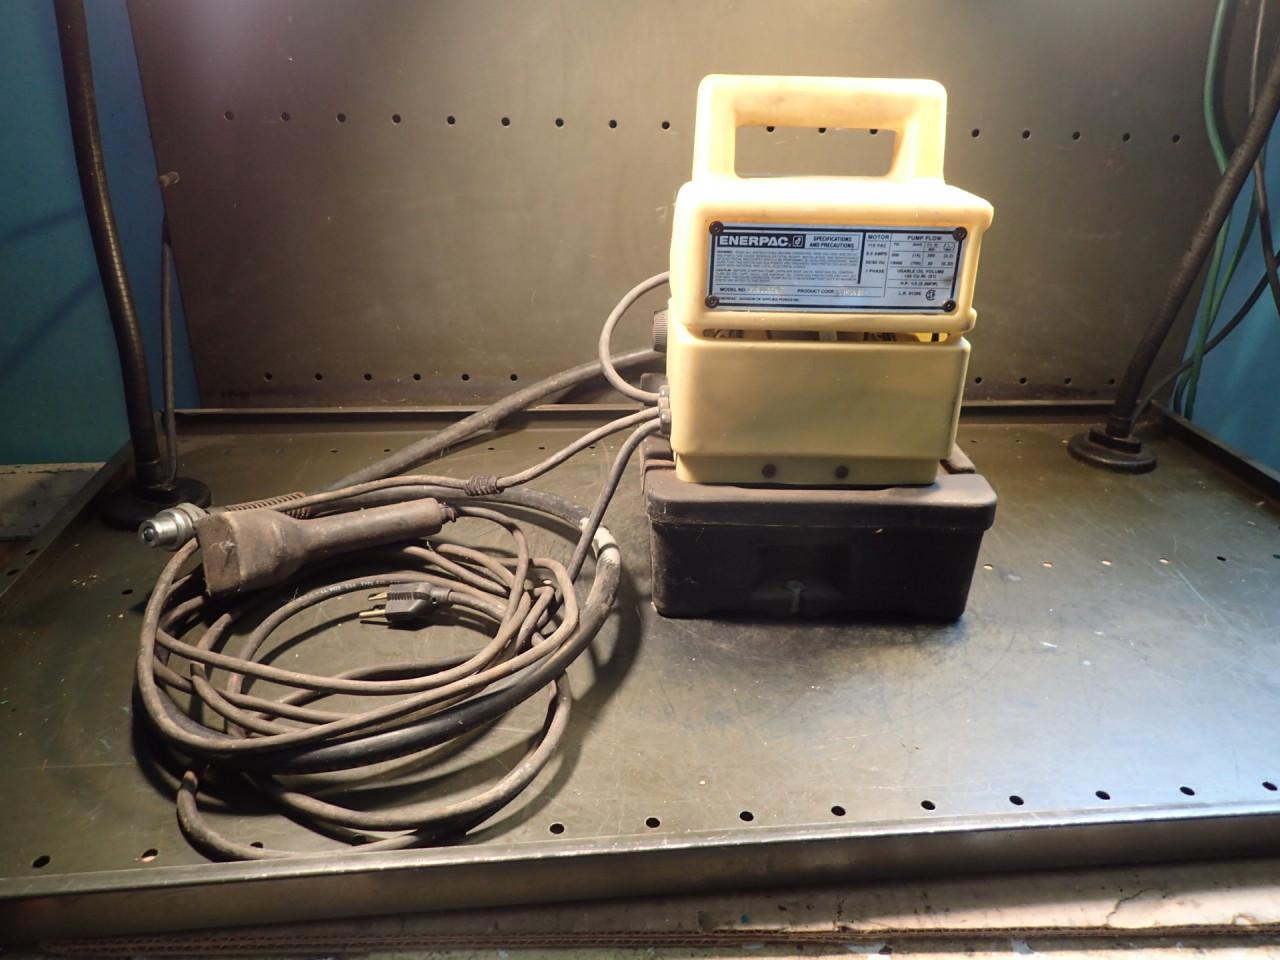 Enerpac PUD1100B Portable Electric Hydraulic Pump: 120 VAC, 10,000 10K PSI, Used